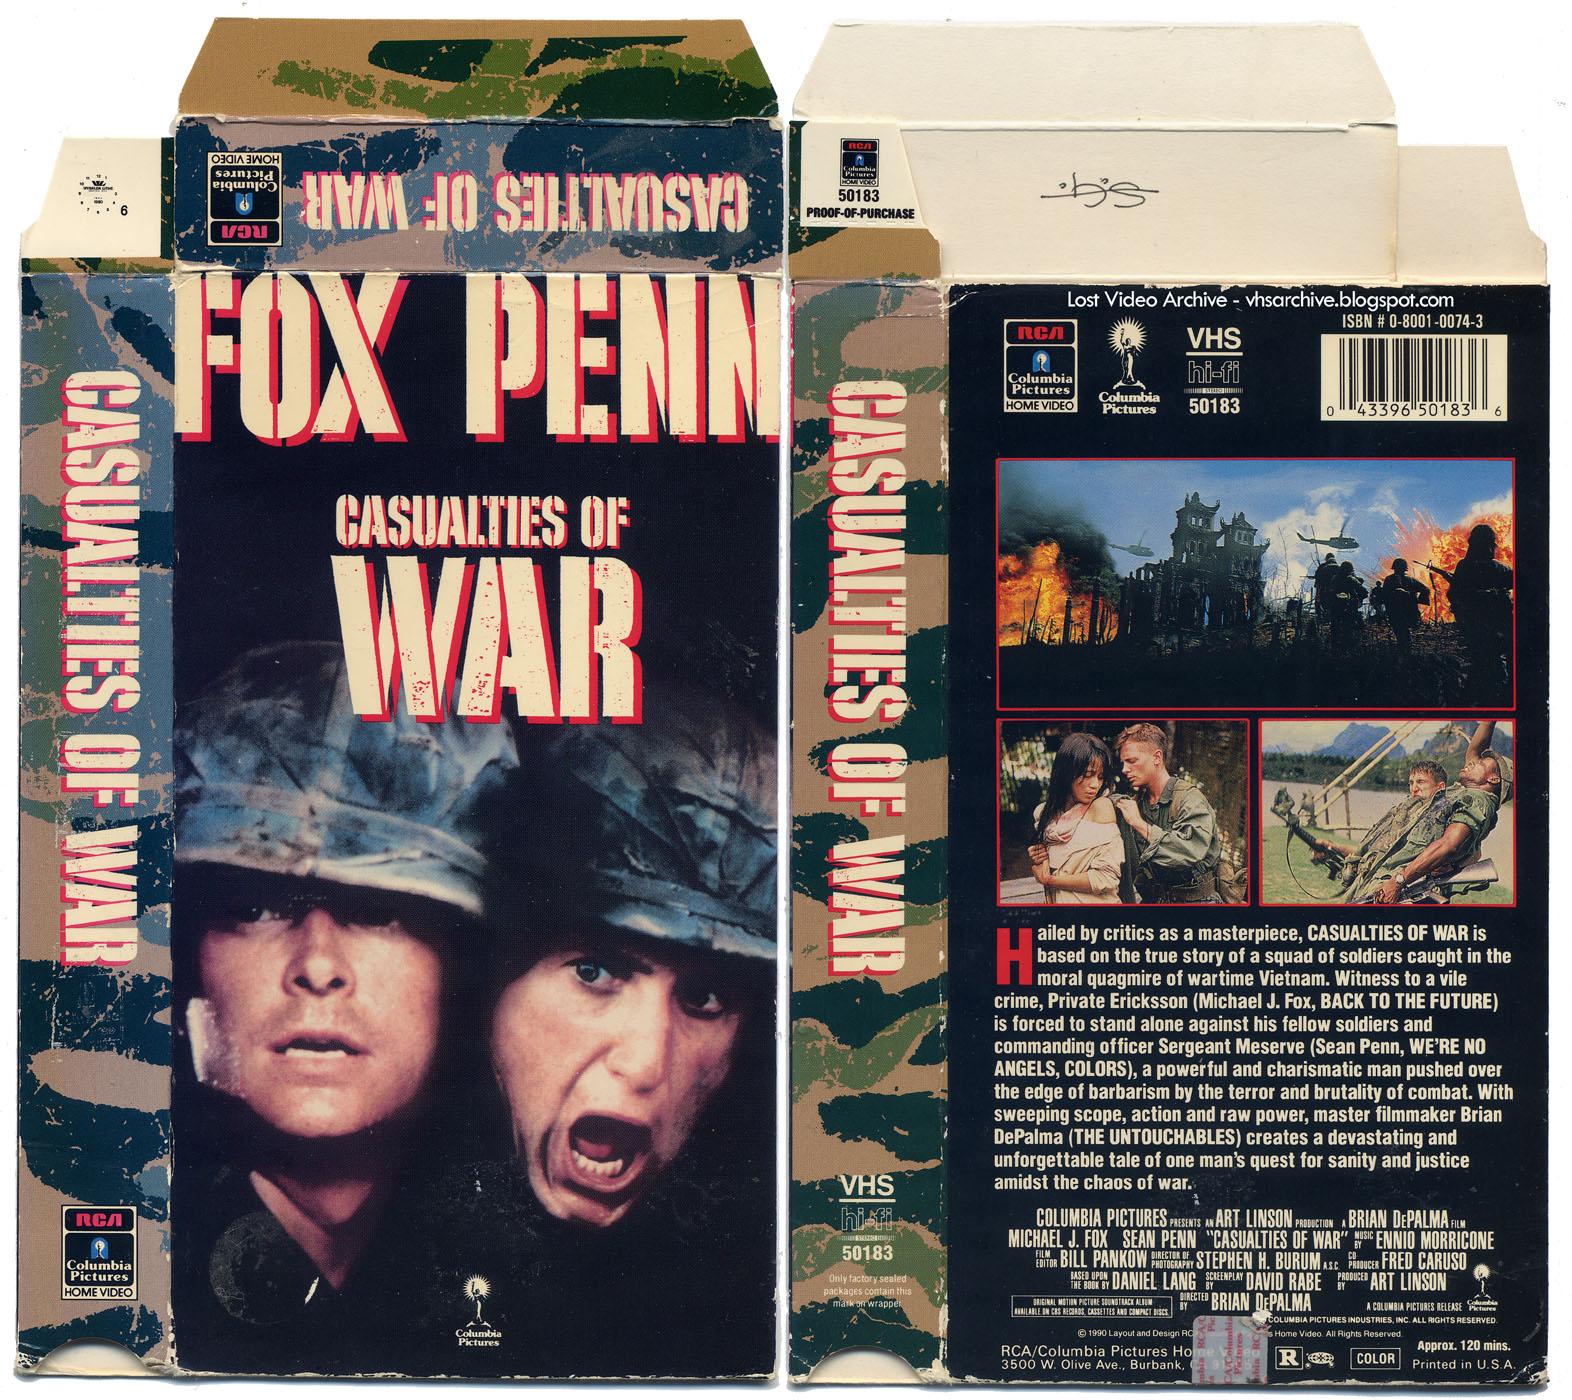 http://1.bp.blogspot.com/_LN_P9uZB4ig/TFhLHivQvlI/AAAAAAAADoM/pYcOpqtQgRY/s1600/Casualties+of+War+VHS+box.jpg